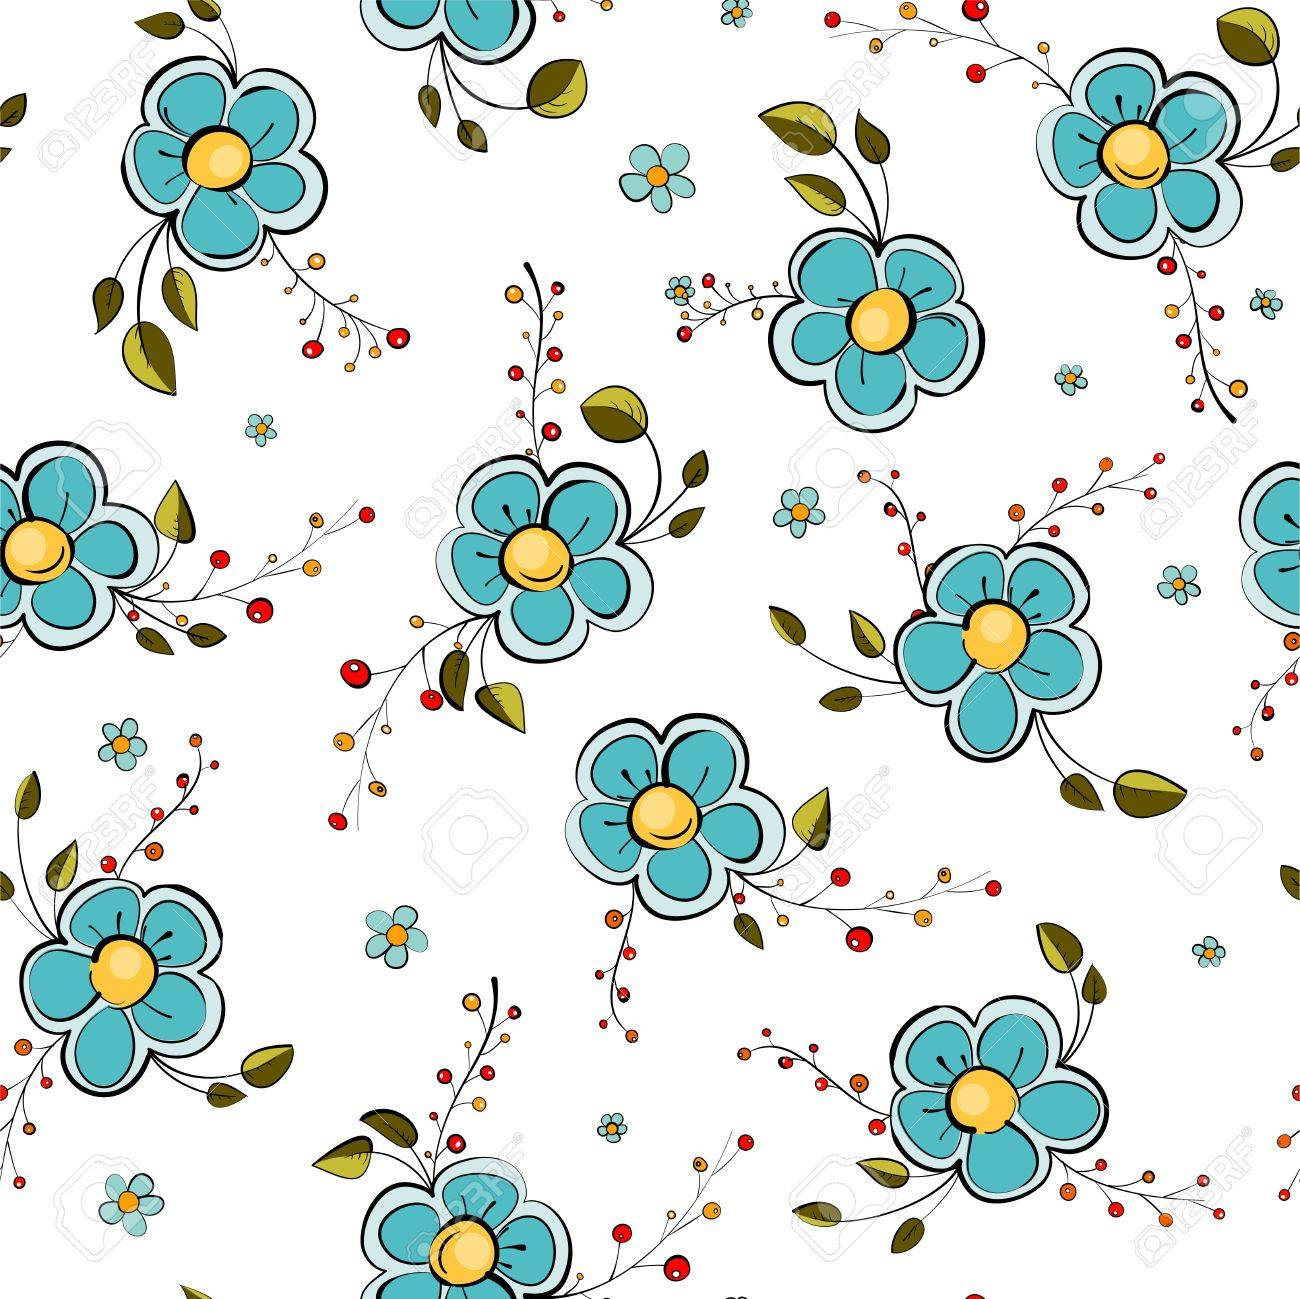 Blue Flowers Seamless Pattern Stock Vector - 16317154